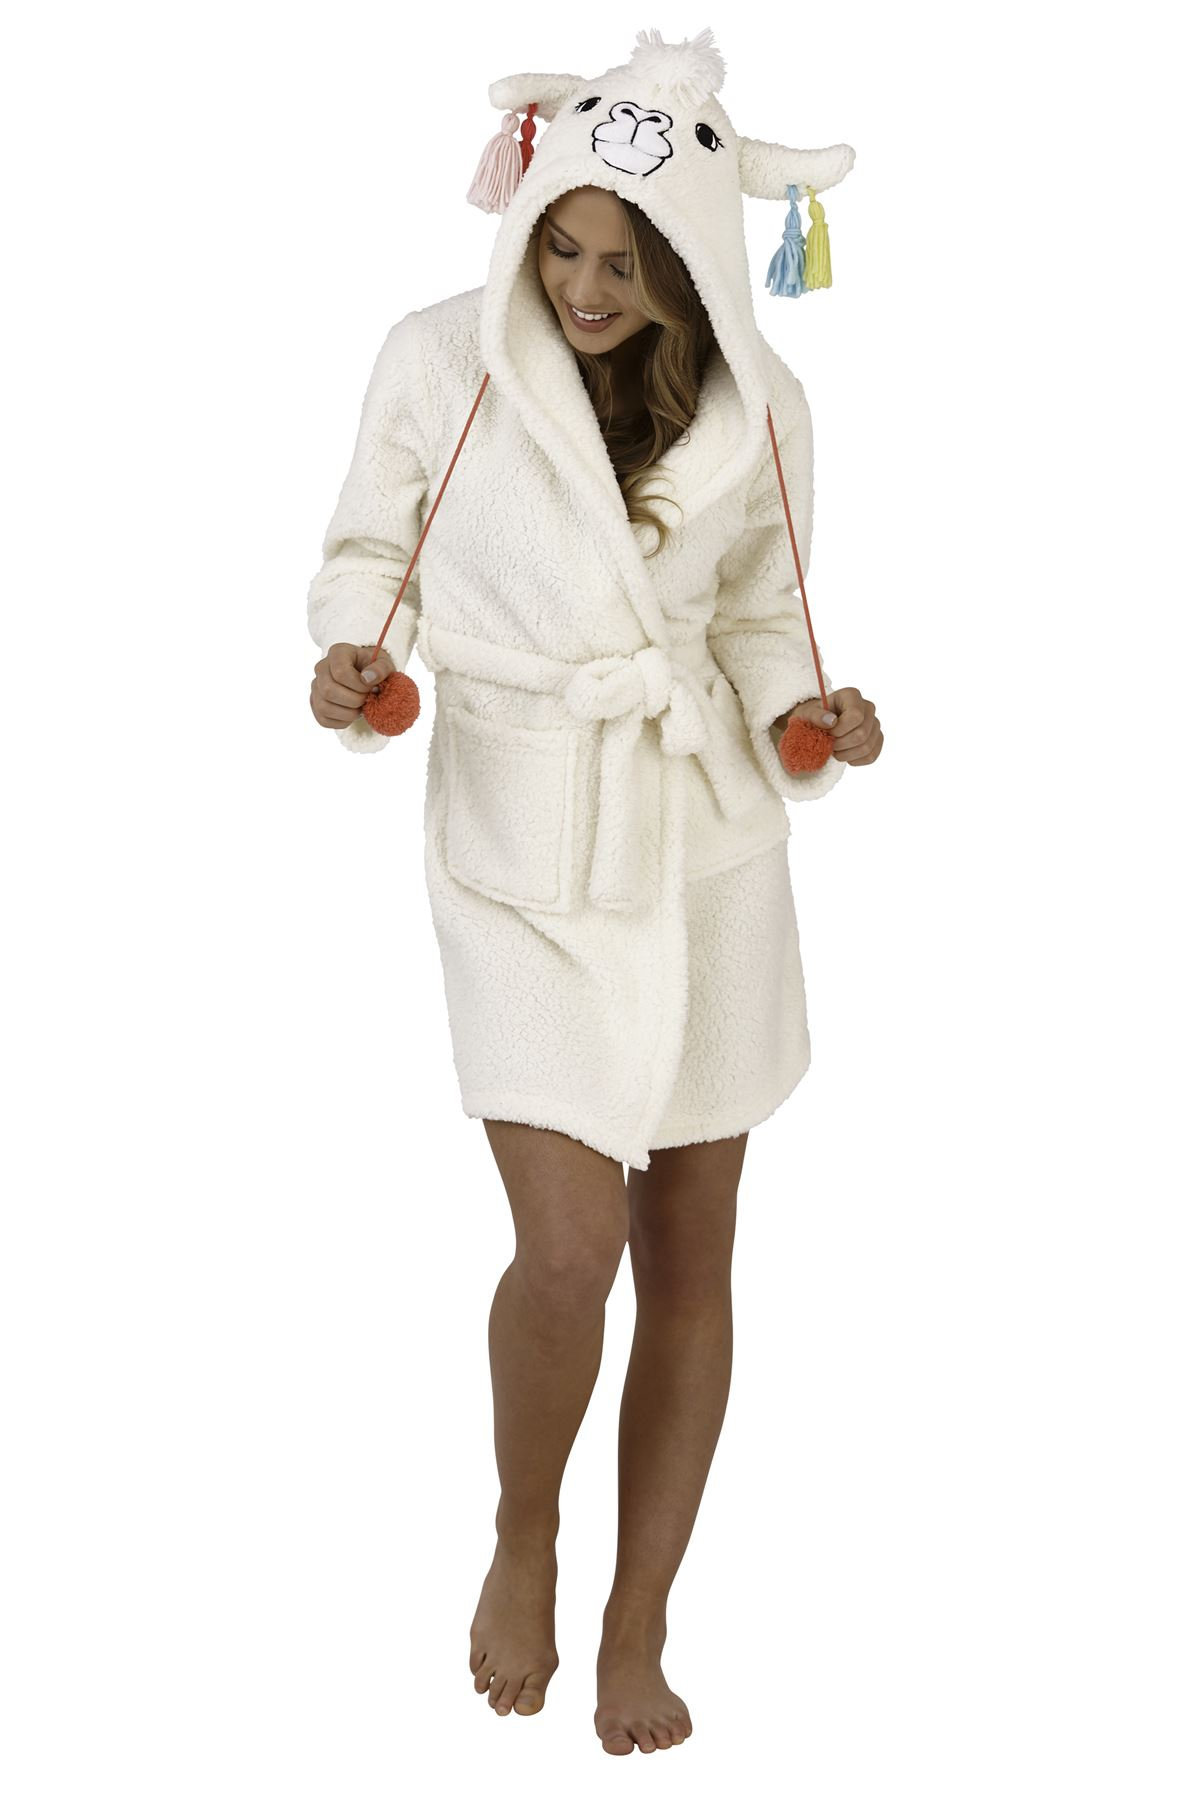 d85190077336f Llama All In One Nightshirt Ladies Girls Novelty Pyjamas Make A Gift ...